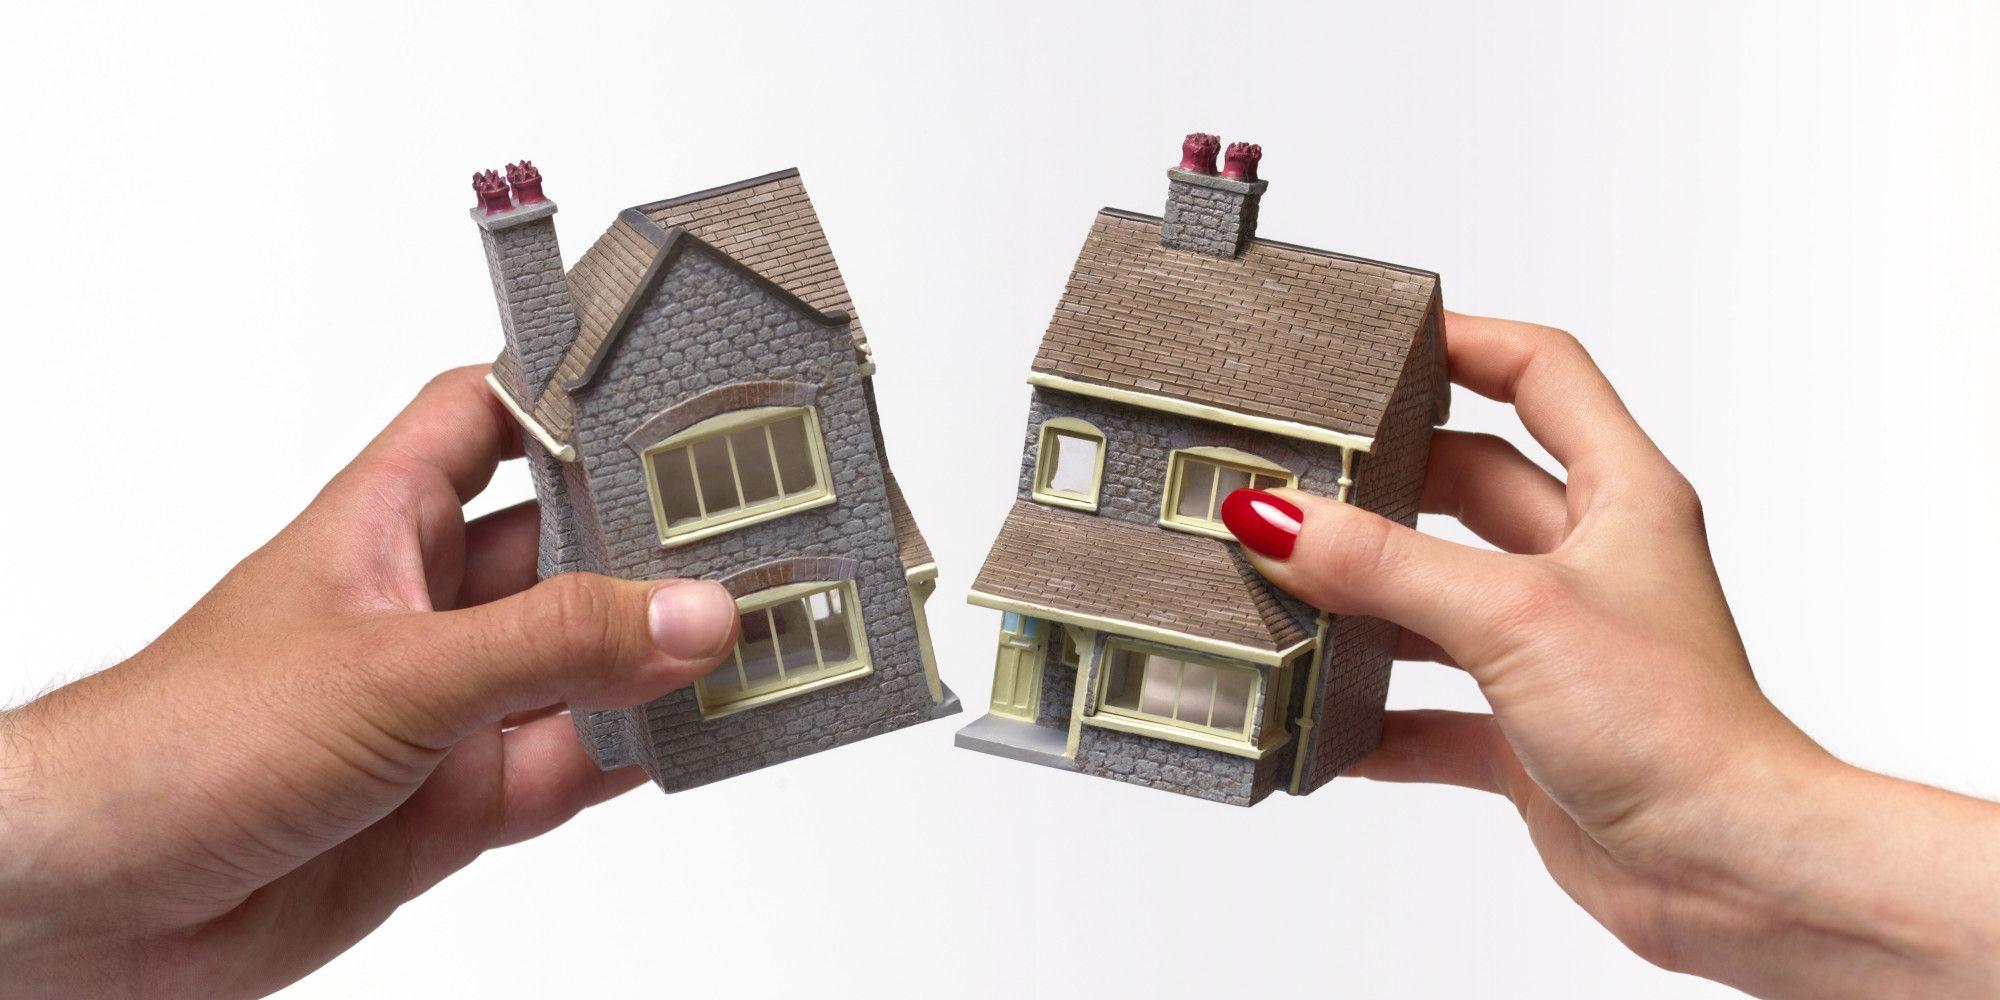 надеялся, цена квартиры при разделе имущества Так думает